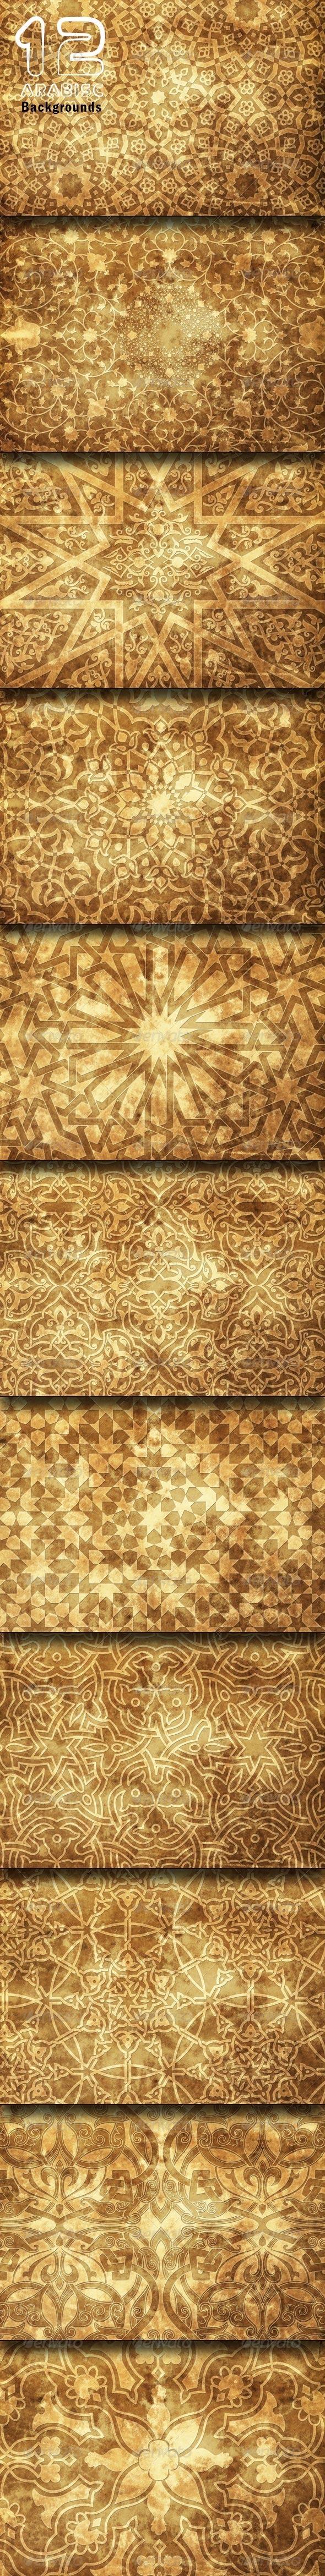 Arabisc Backgrounds - Backgrounds Graphics